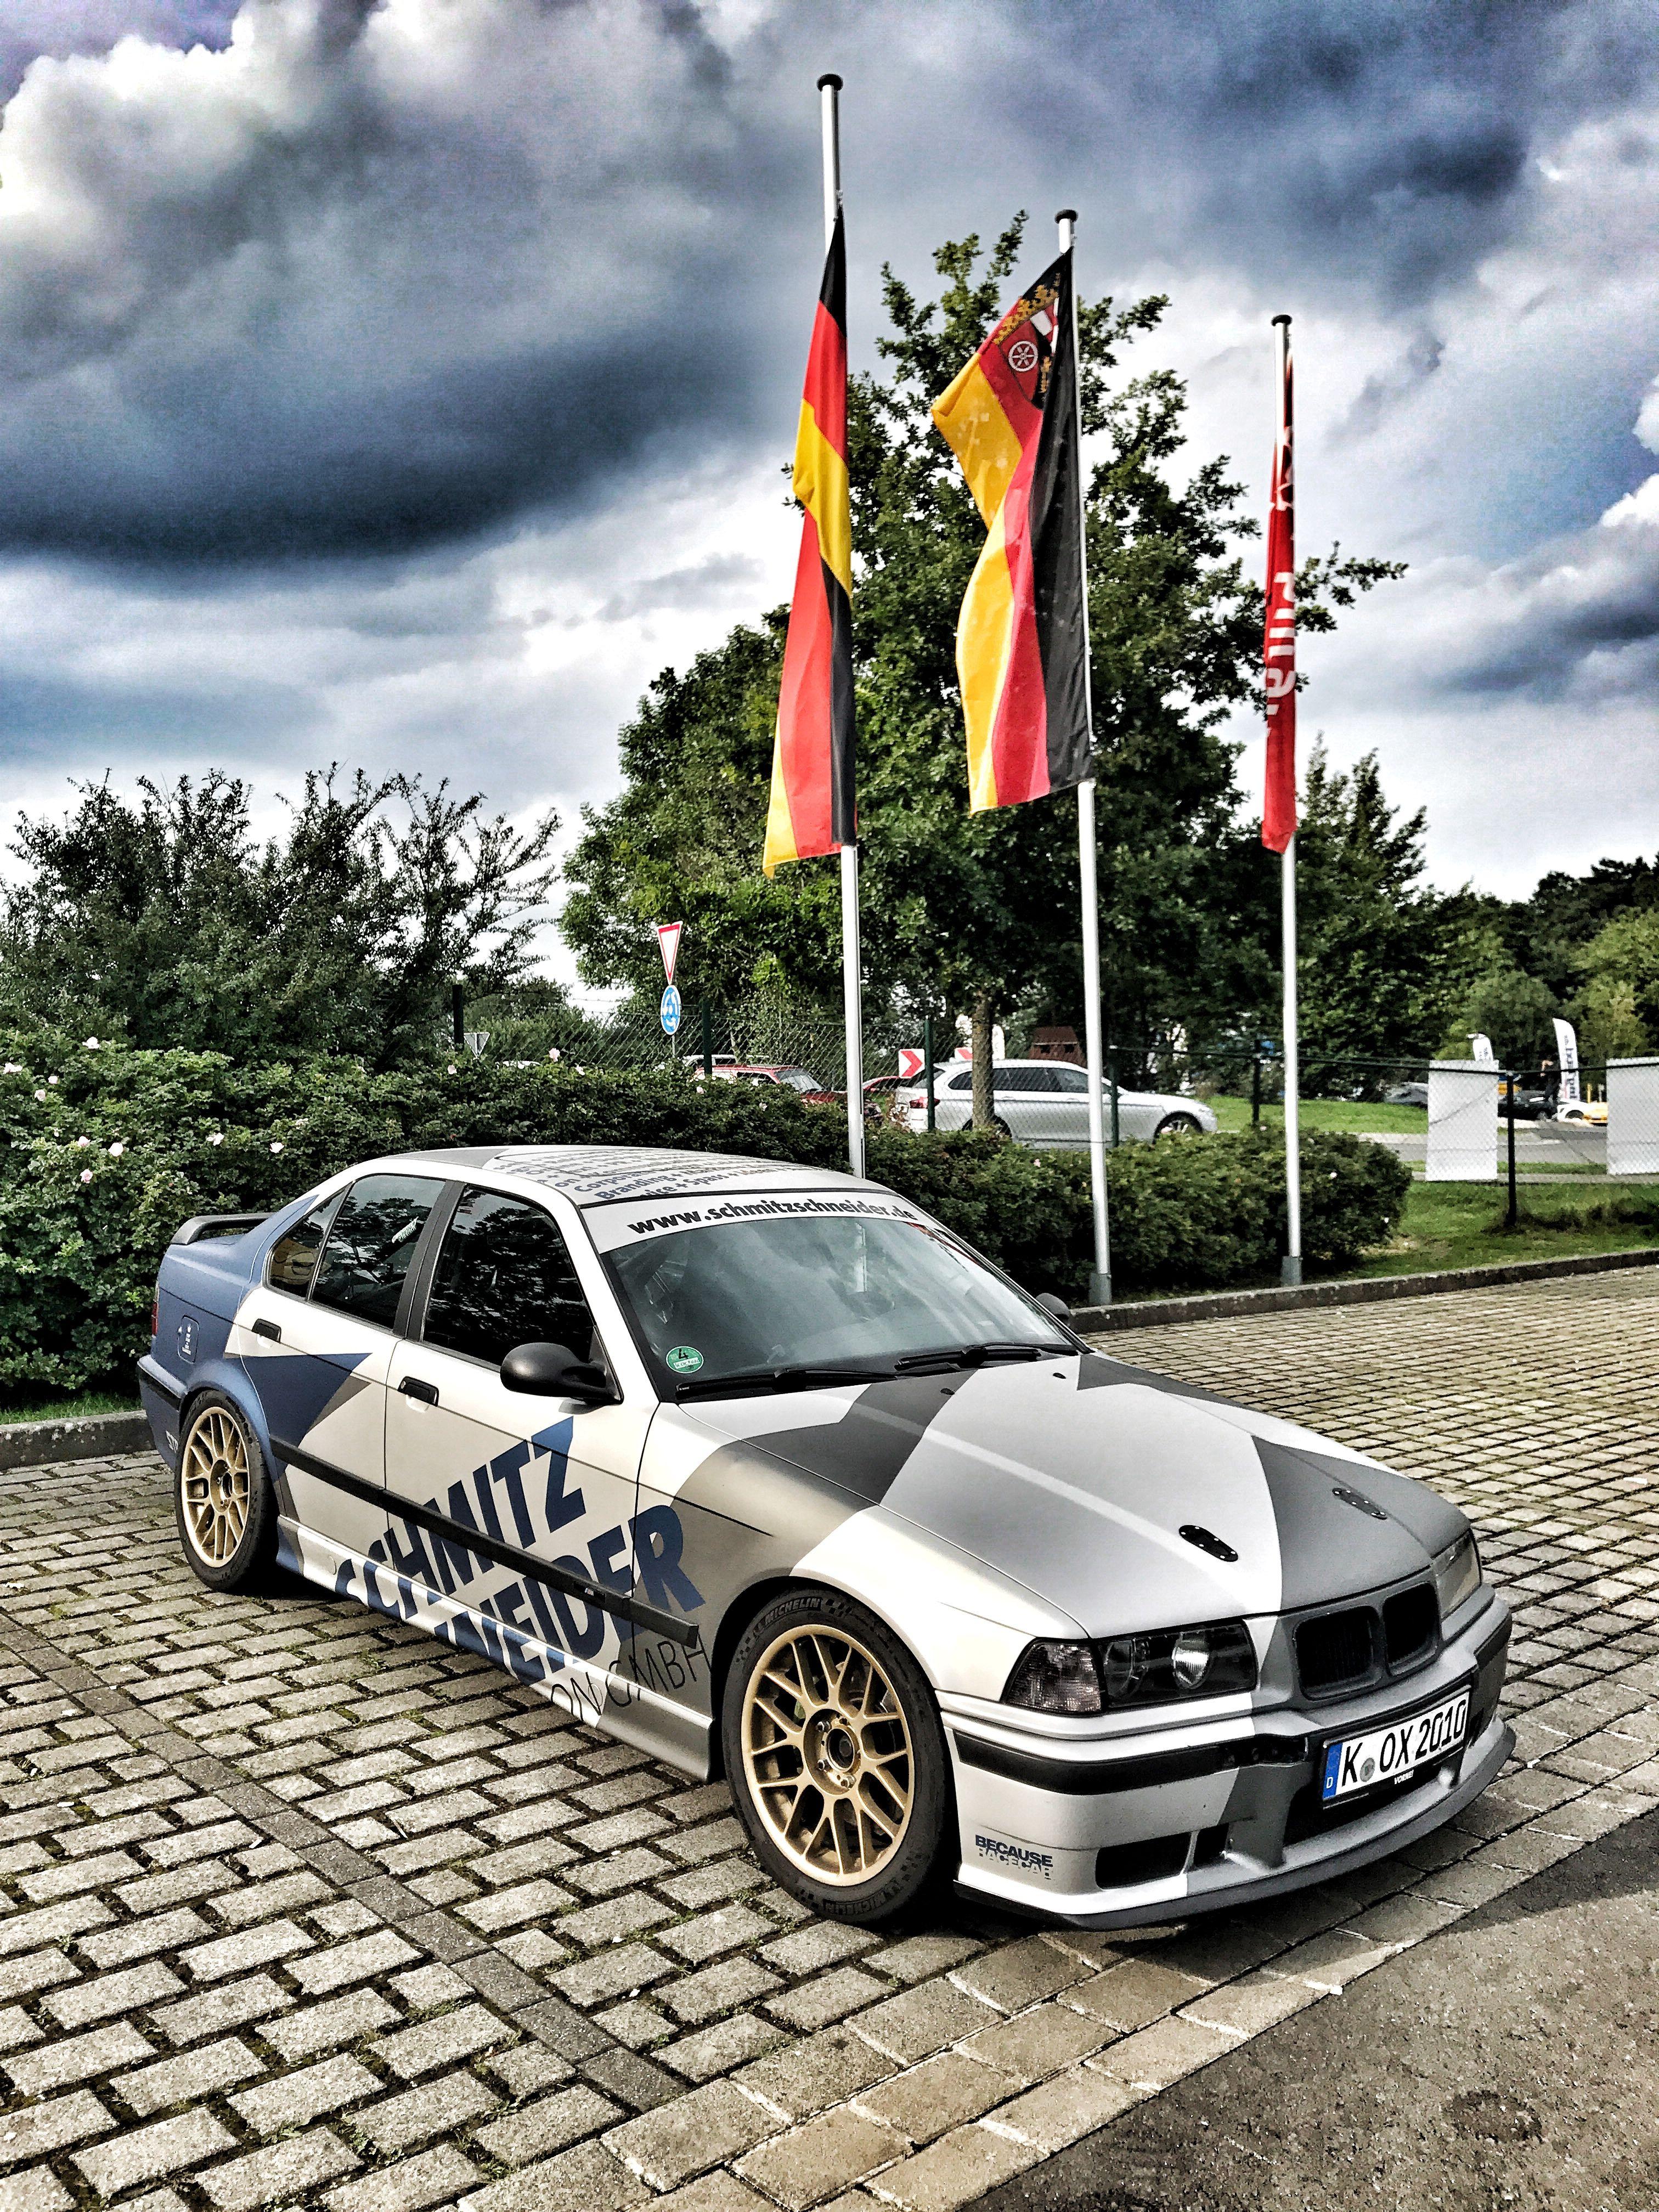 Mpower Bmw E36 325 Nurburgring Ssk E36 E36 Coupe Bmw